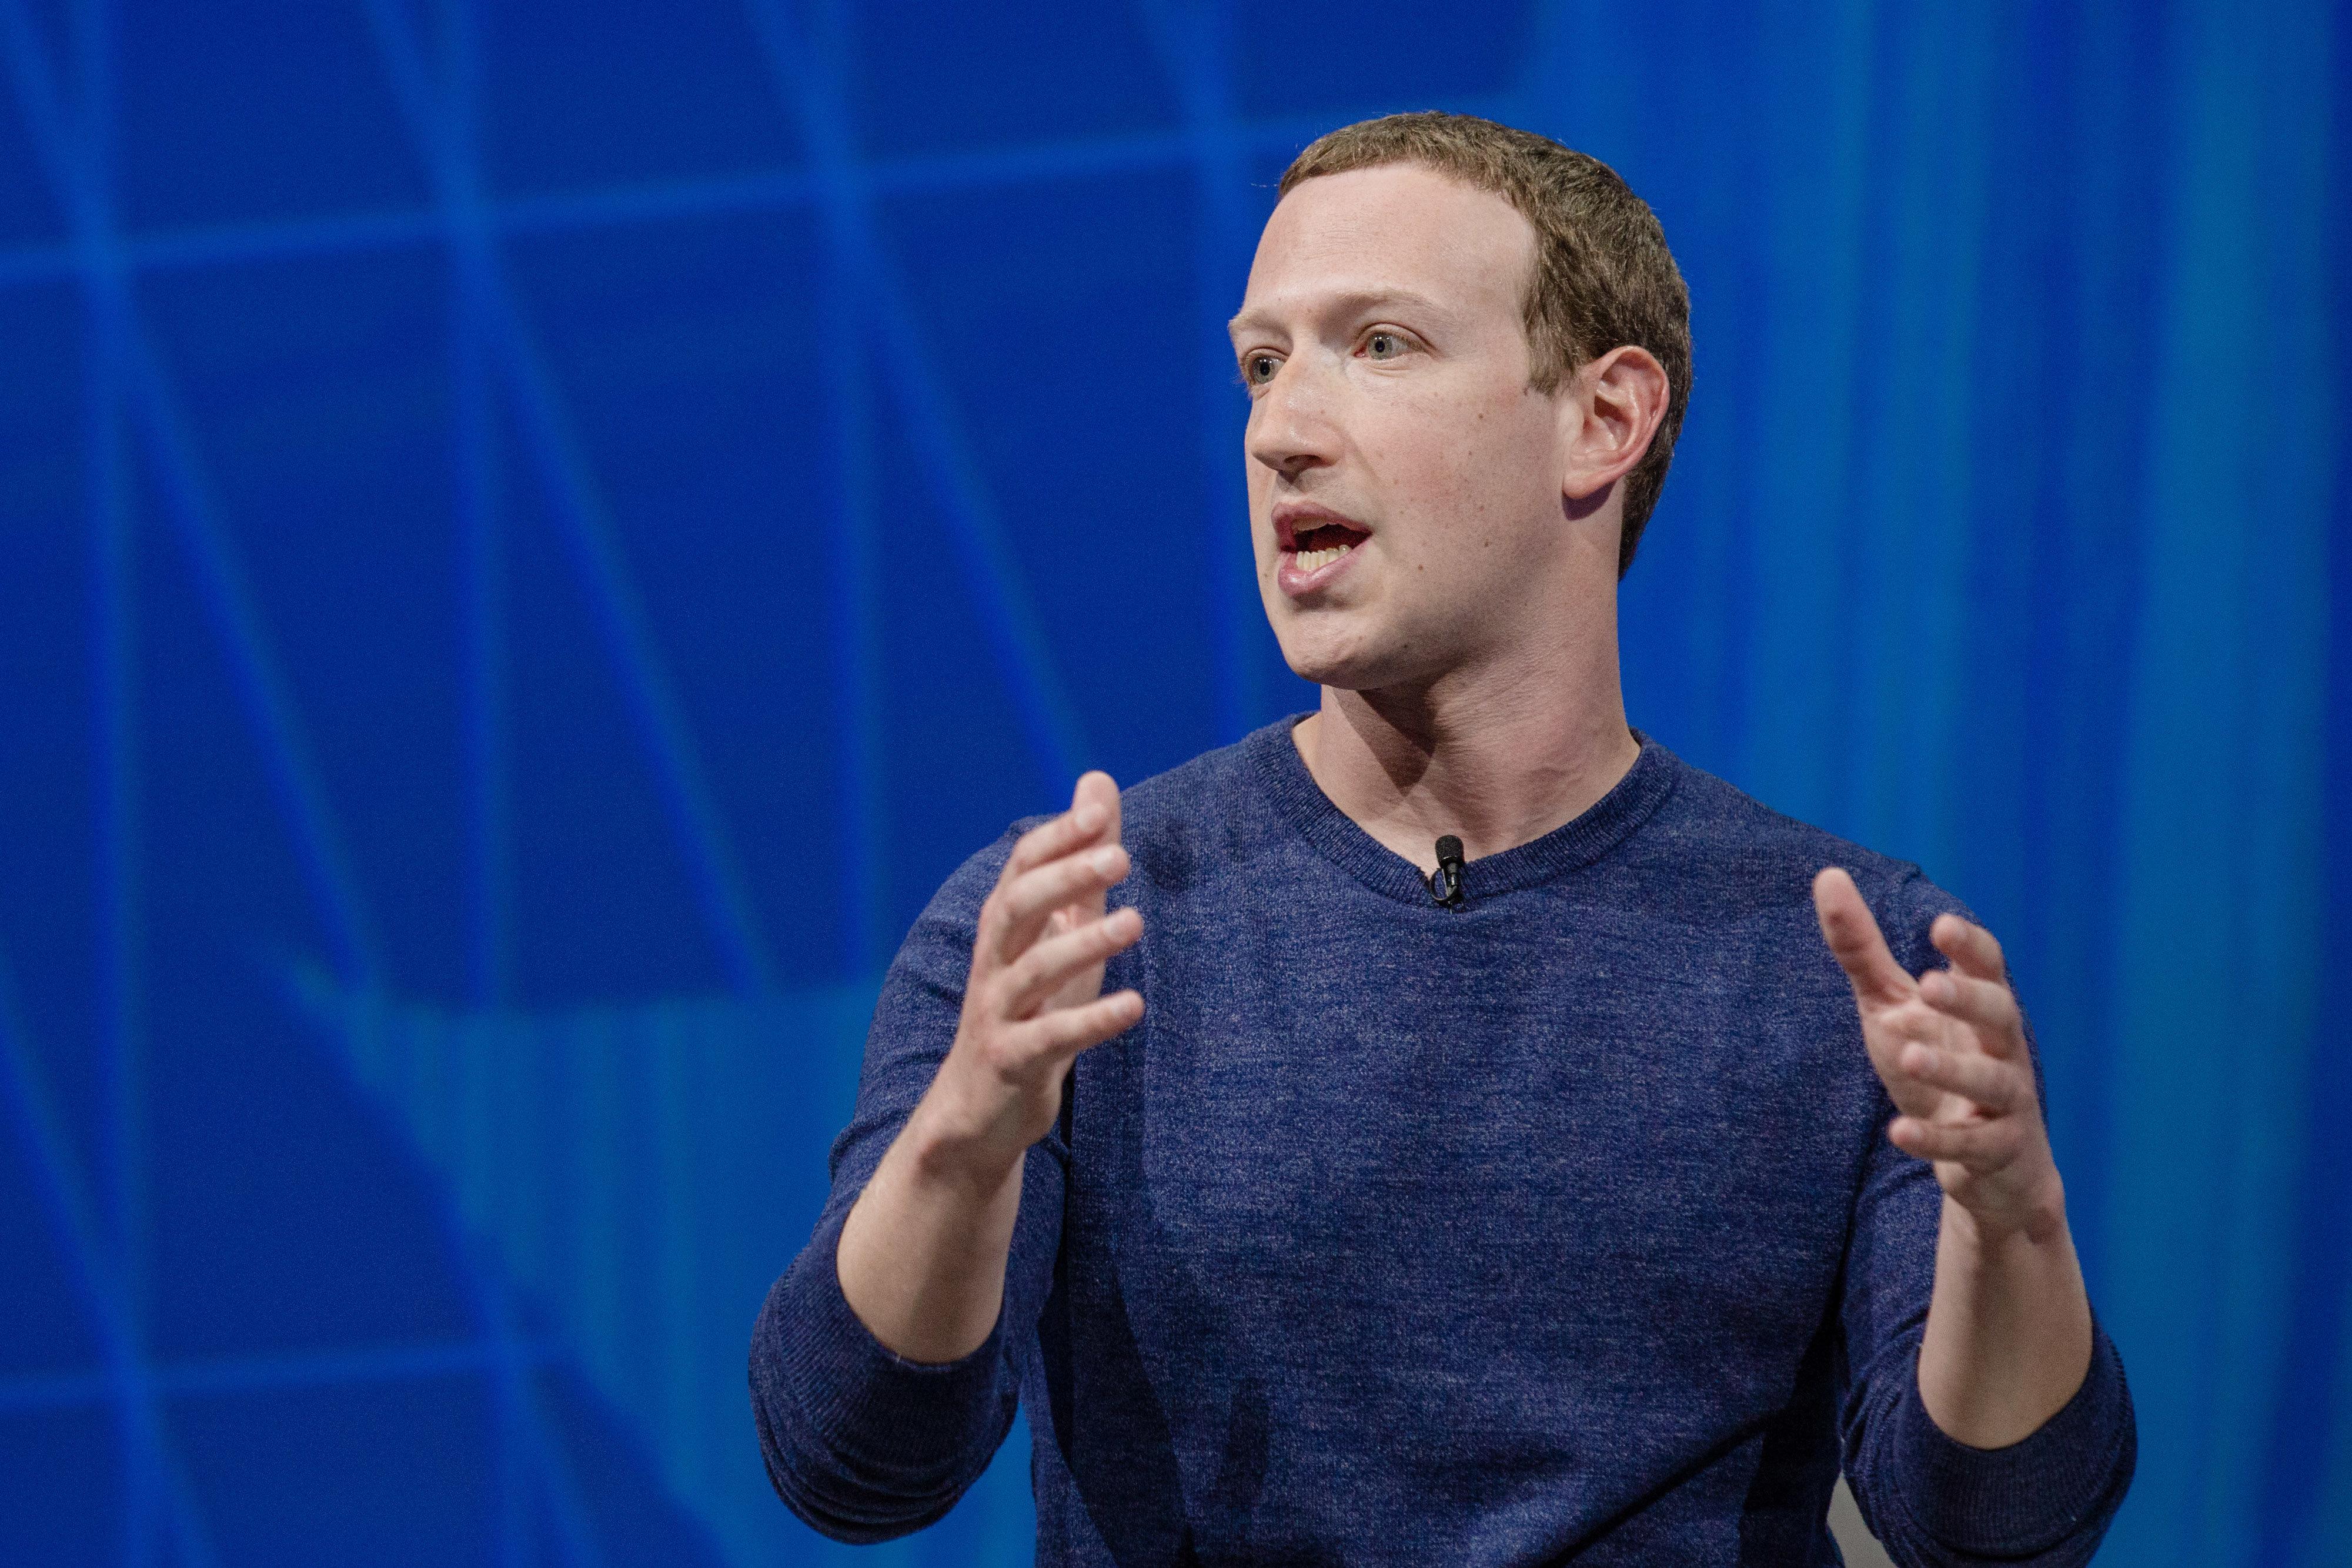 Mark Zuckerberg Says Facebook Won't Remove Holocaust Denial